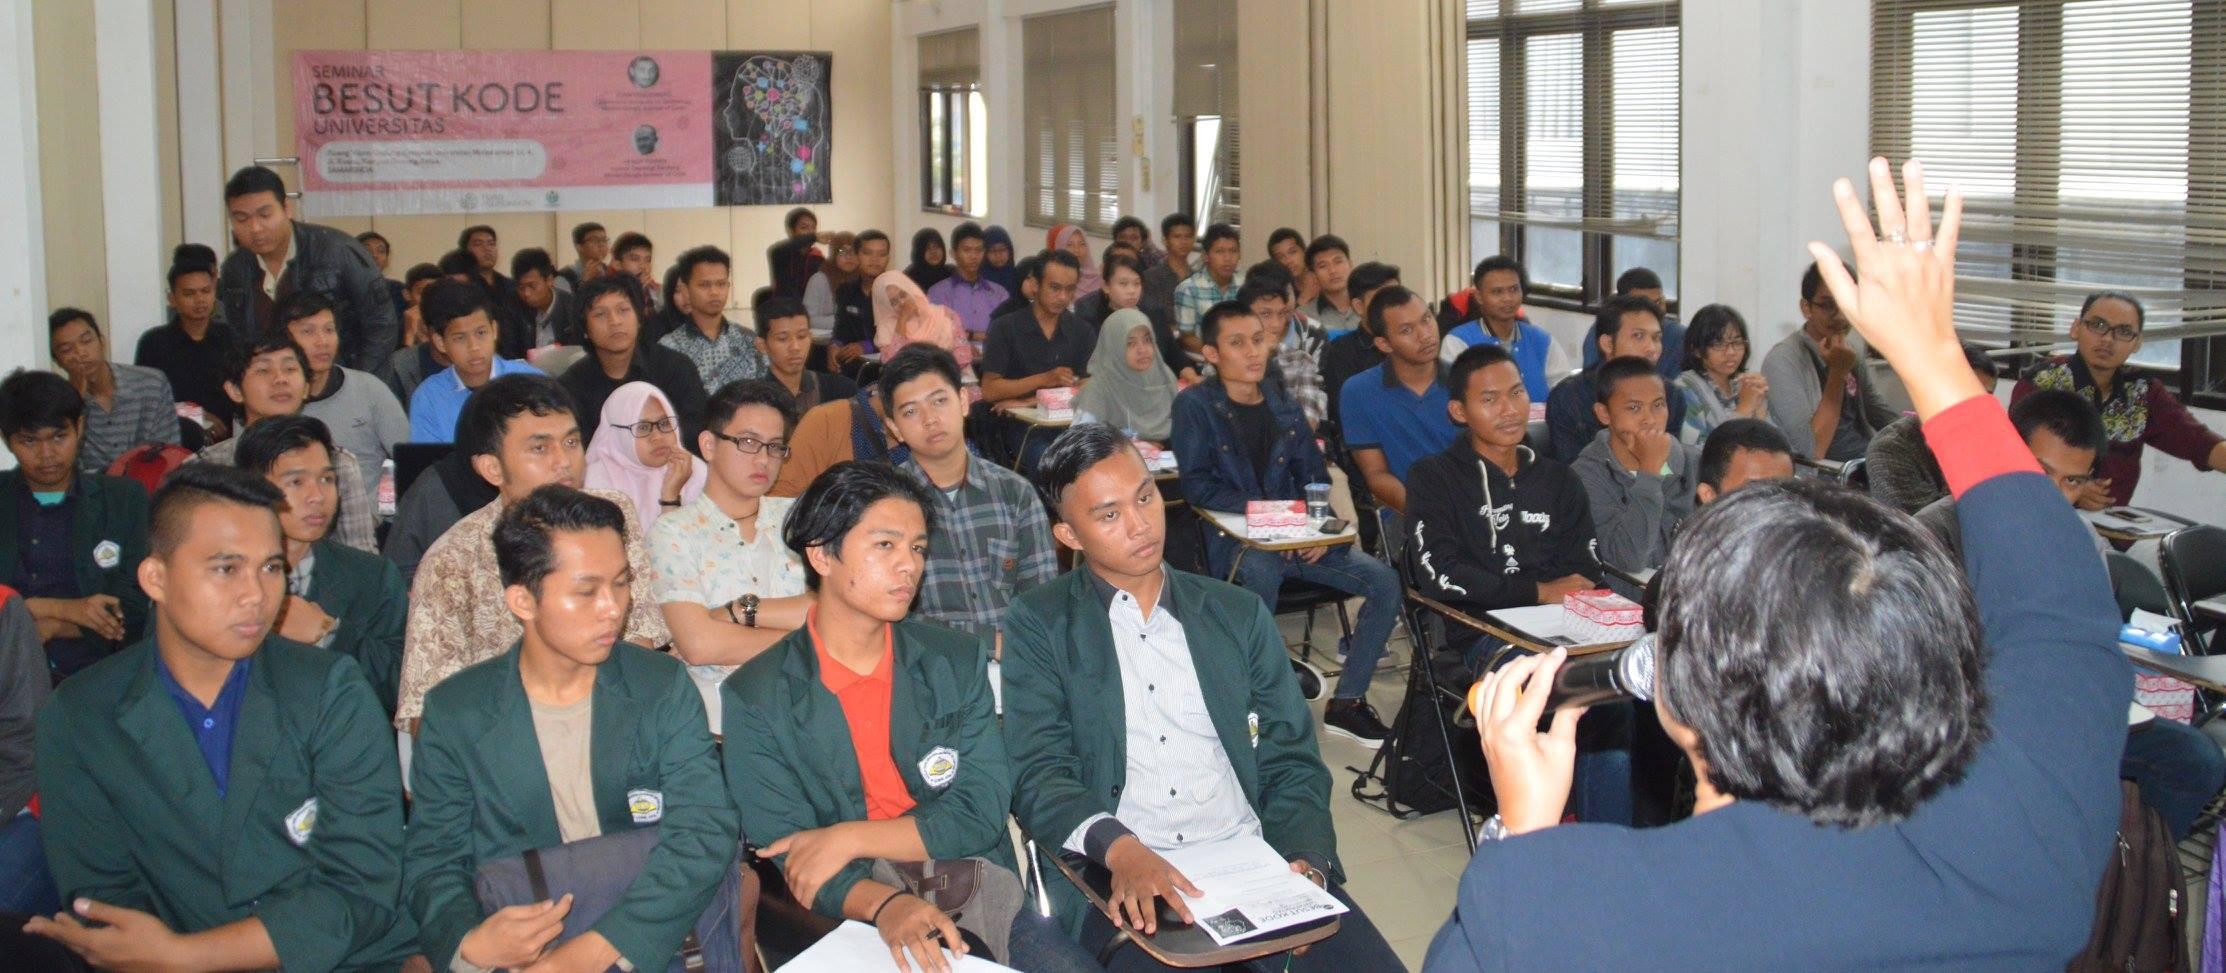 Sosialisasi Besut Kode Universitas di Samarinda